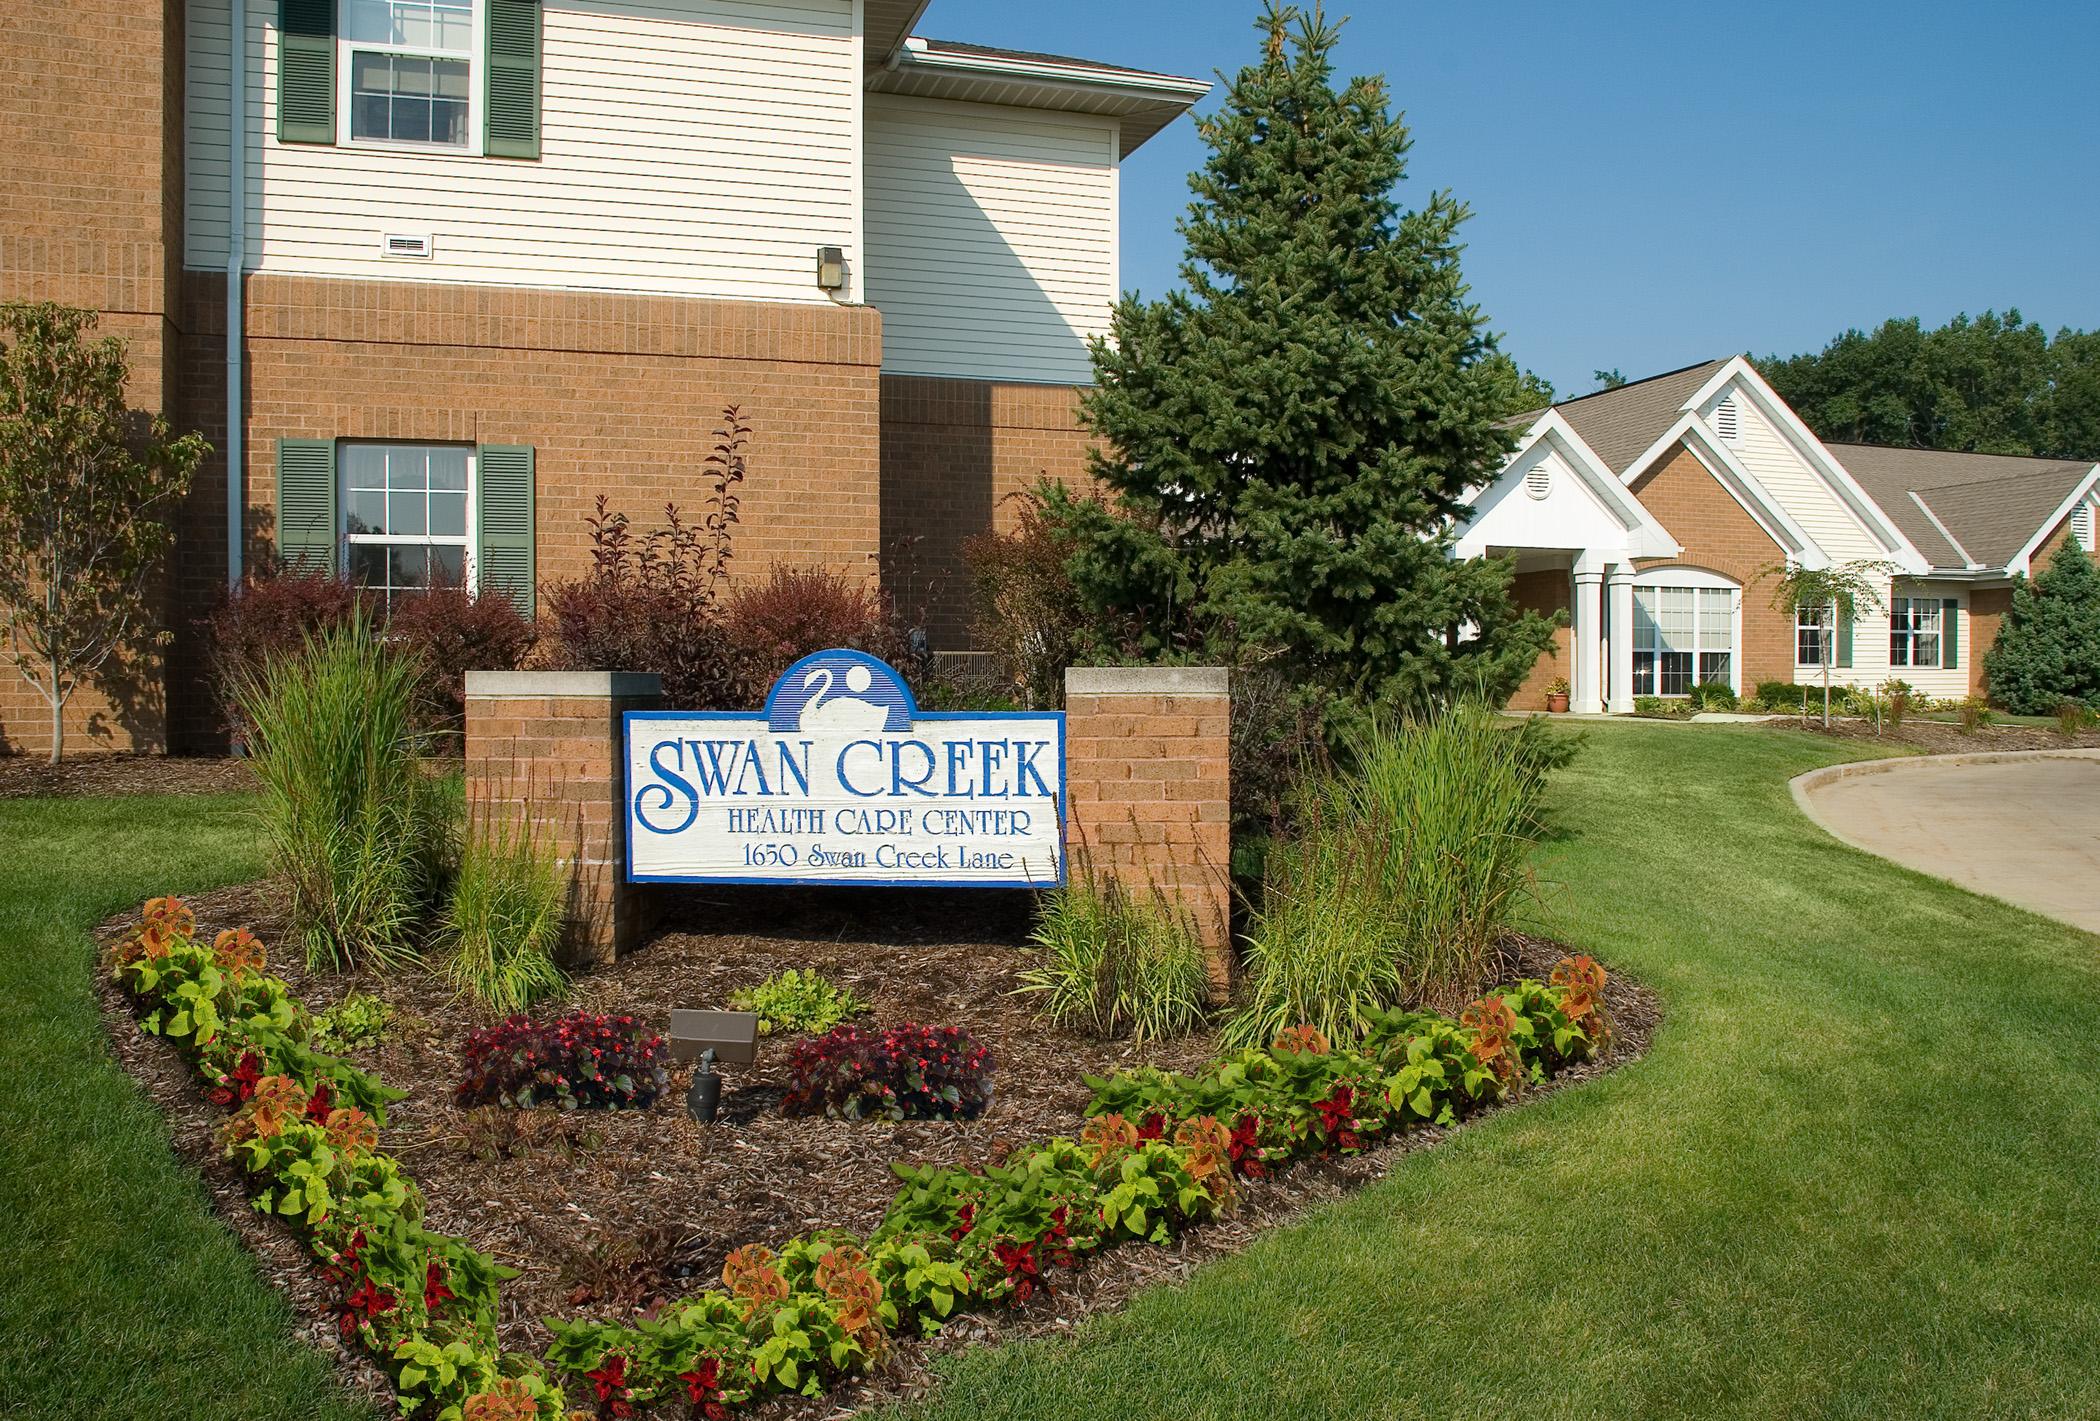 39 U S News 39 Rates Swan Creek Retirement Village In America: best villages in america